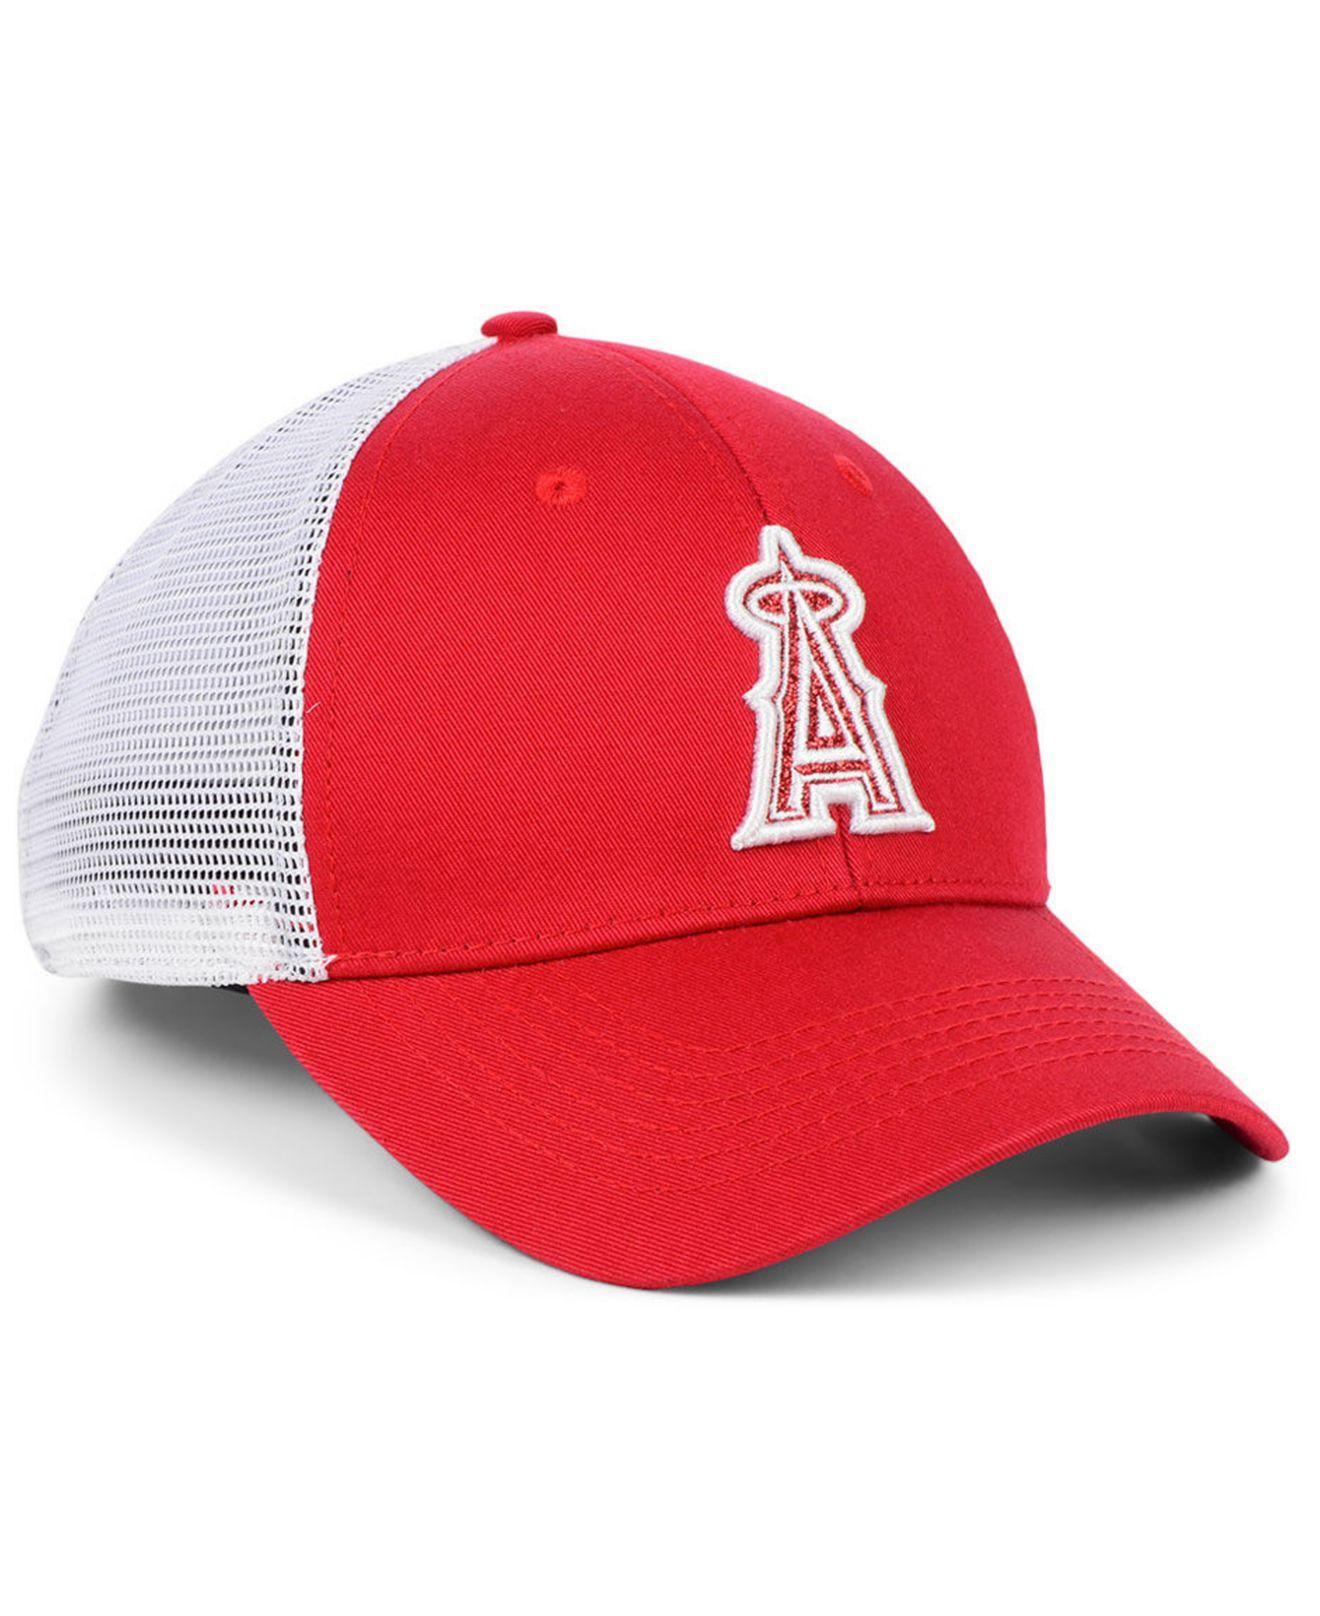 timeless design 1c5b5 e8c44 Lyst - 47 Brand Los Angeles Angels Branson Glitta Trucker Strapback Cap in  Red